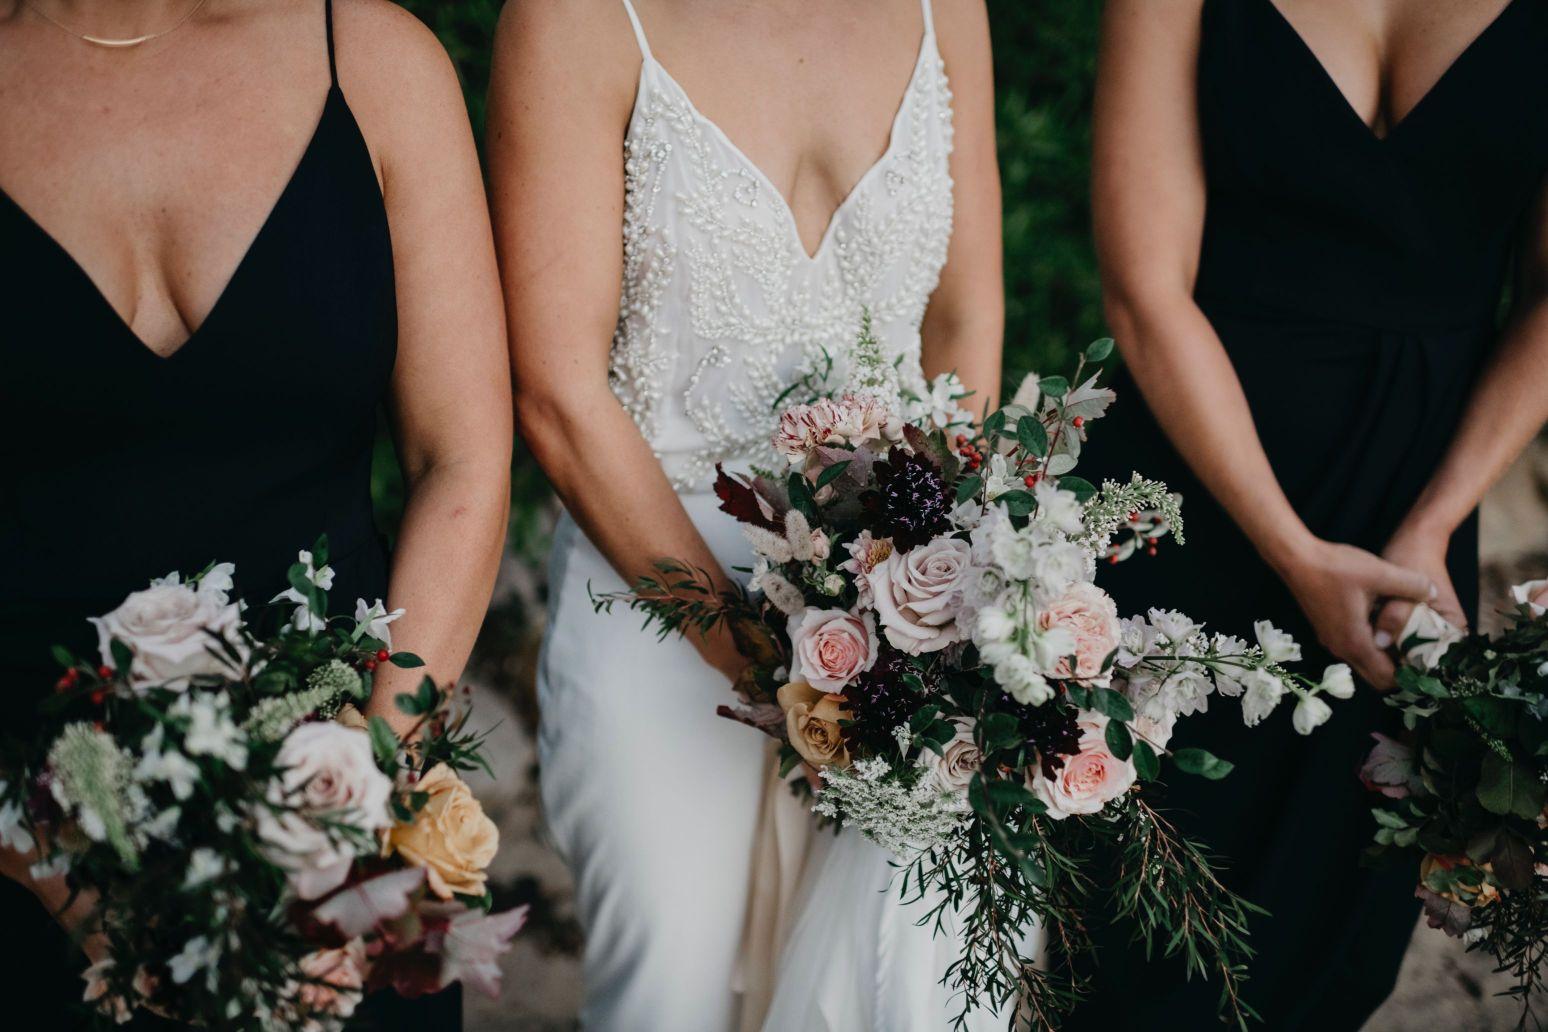 WEDDING FLOWERS FLORAL DESIGNER BRIDAL BOUQUET SYDNEY